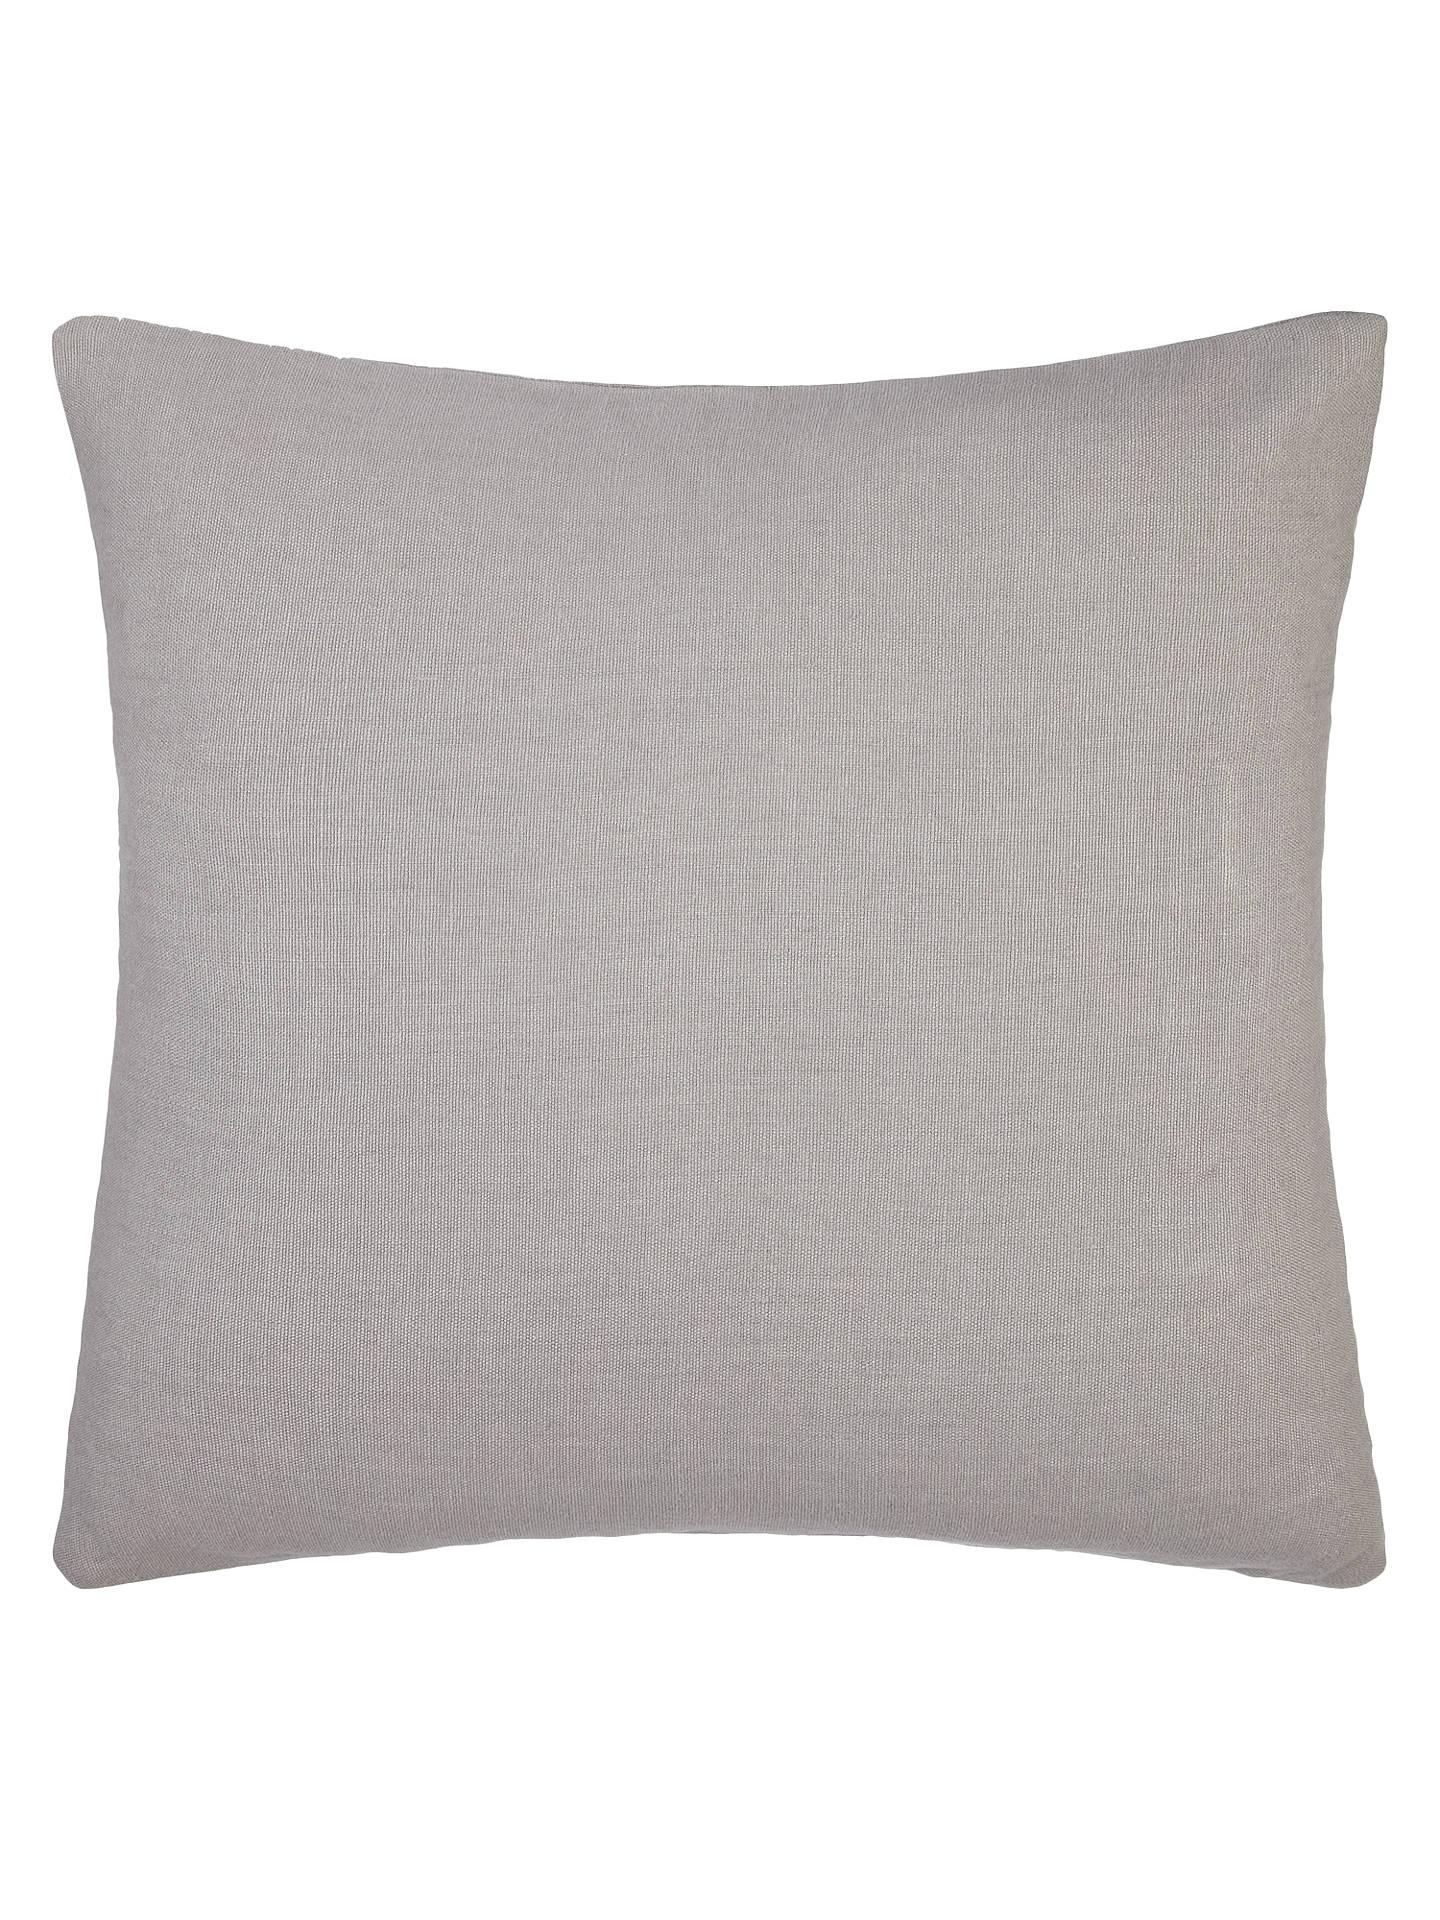 john lewis linen cushion at john lewis partners. Black Bedroom Furniture Sets. Home Design Ideas